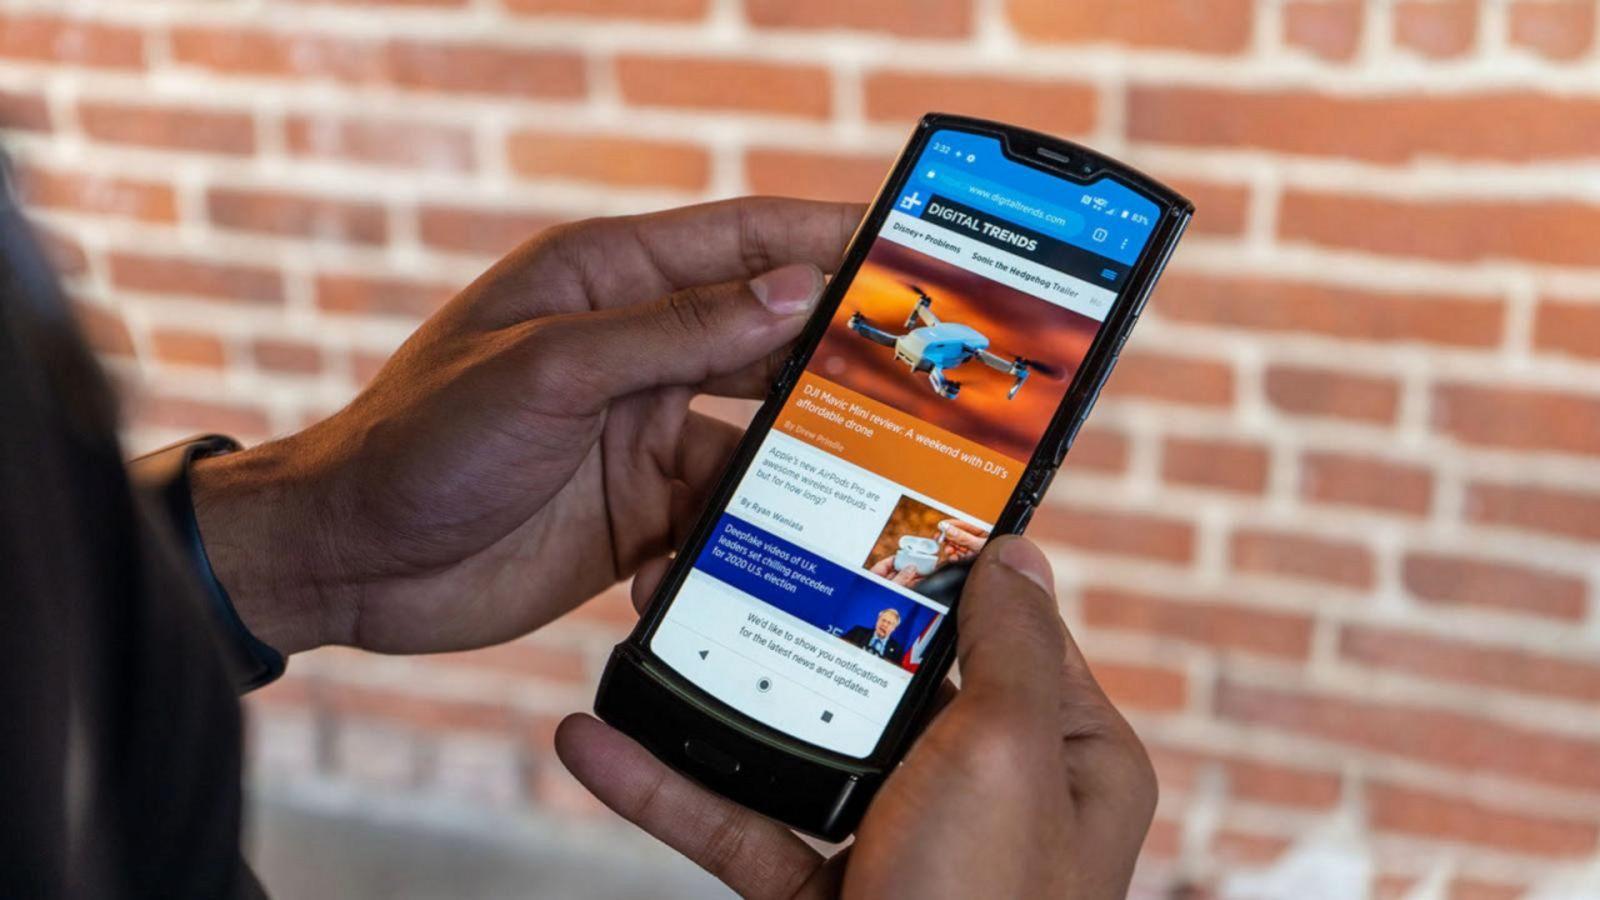 Best Motorola Phone 2020.Motorola Relaunching Its Iconic Razr Flip Phone Abc News